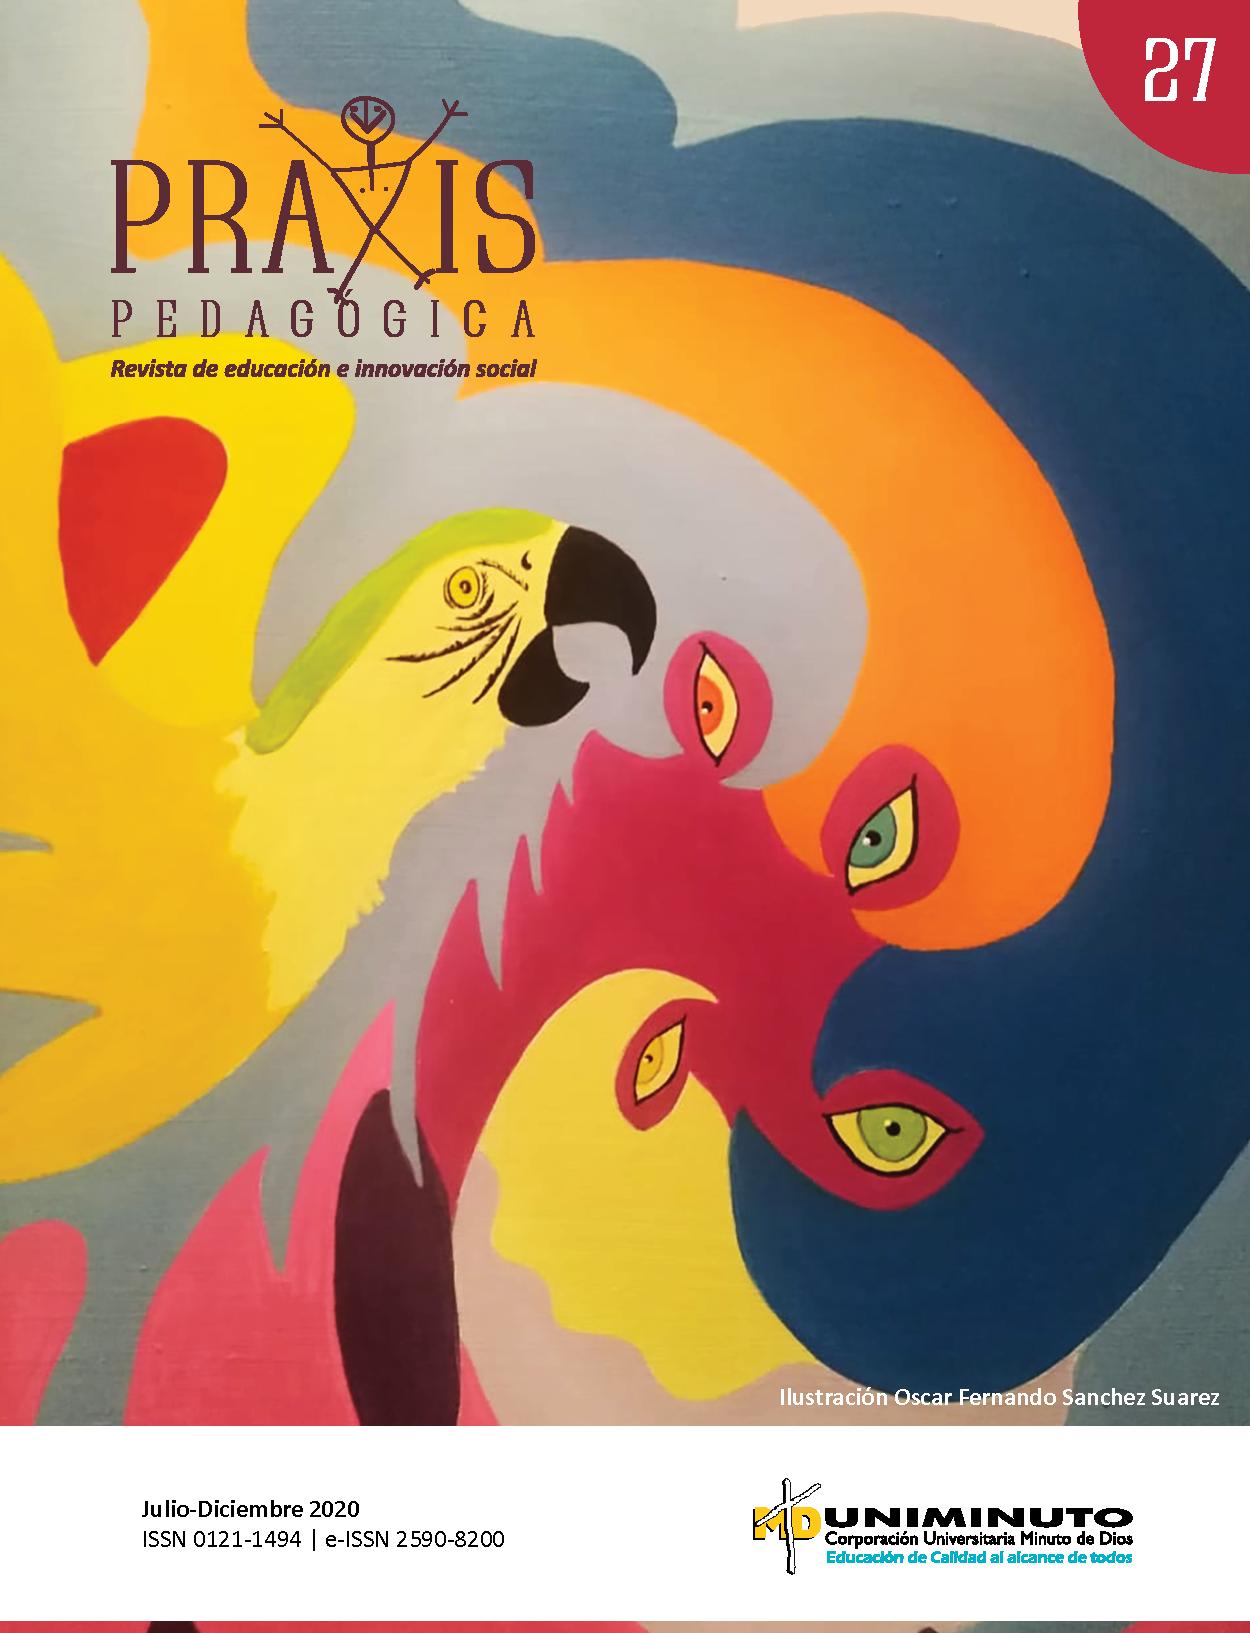 https://revistas.uniminuto.edu/public/journals/9/cover_issue_209_es_ES.png